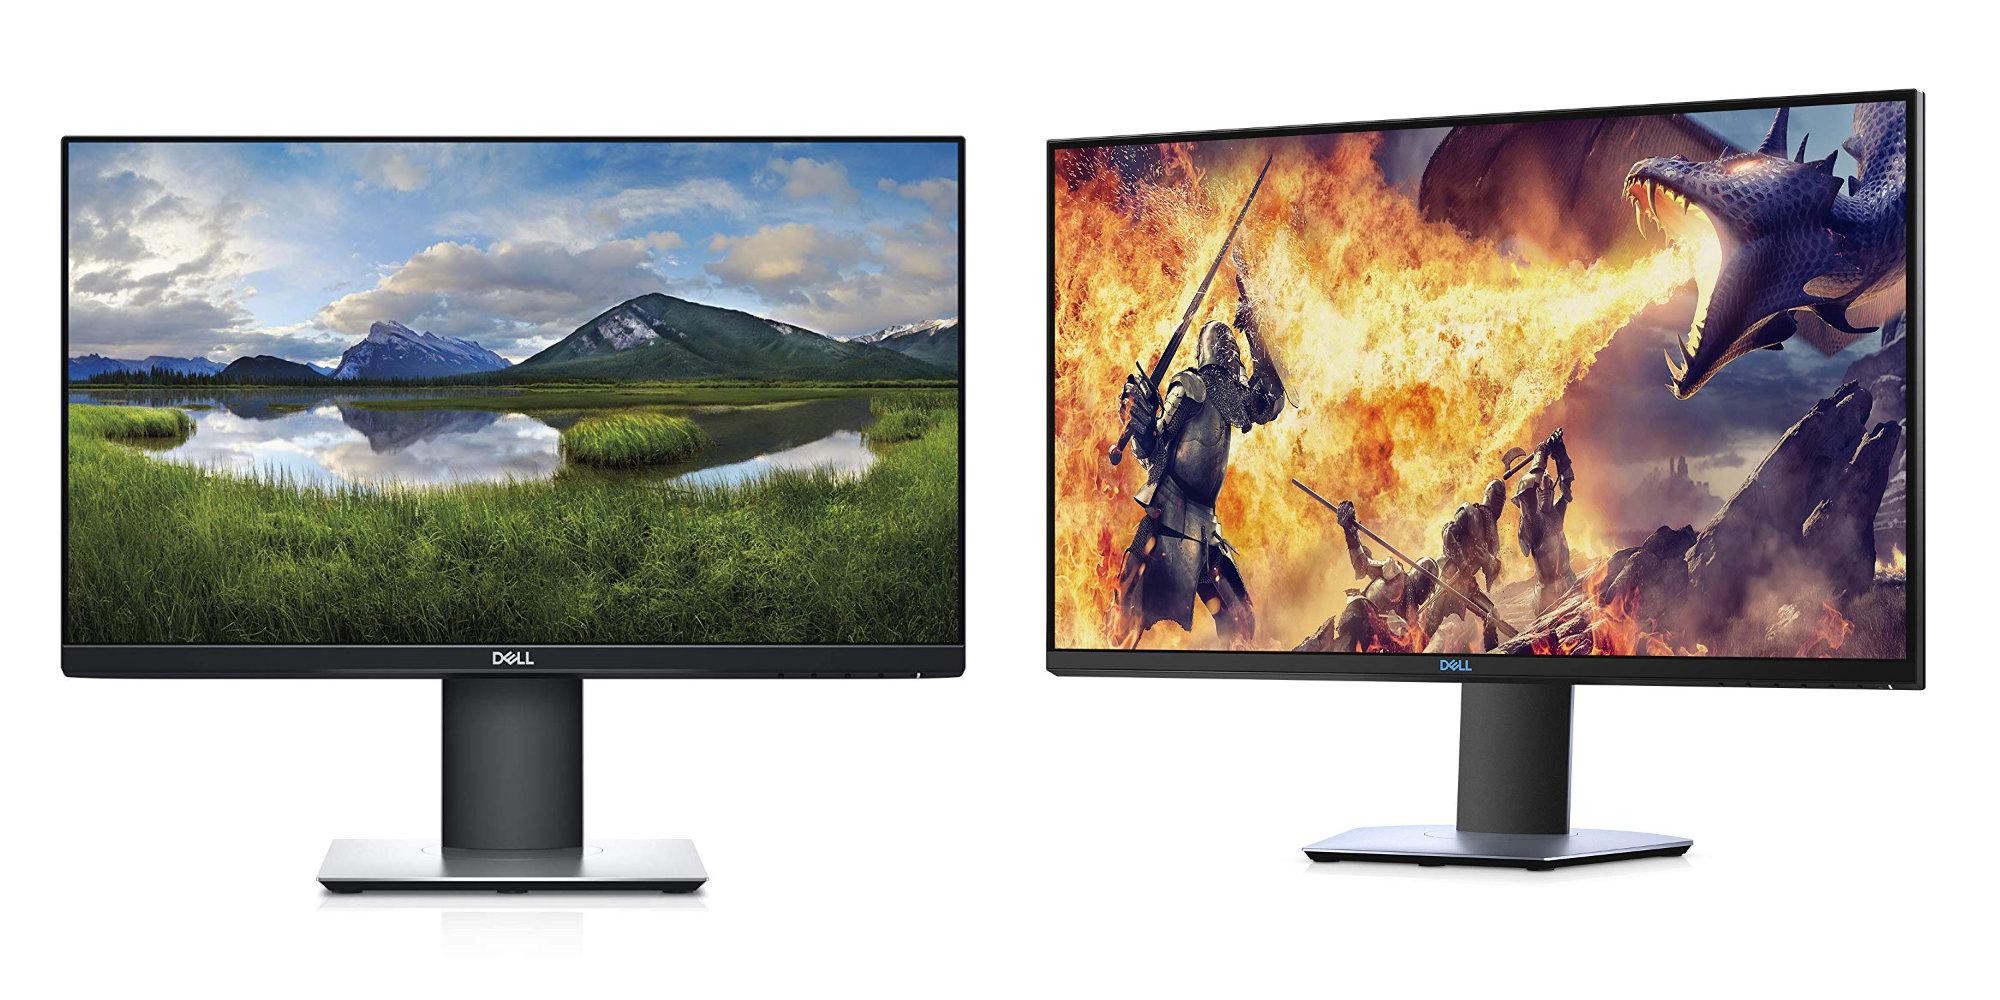 Ultra-thin bezels + a USB hub make Dell's 27-inch Full HD Monitor great at $200 (Save $55+), more